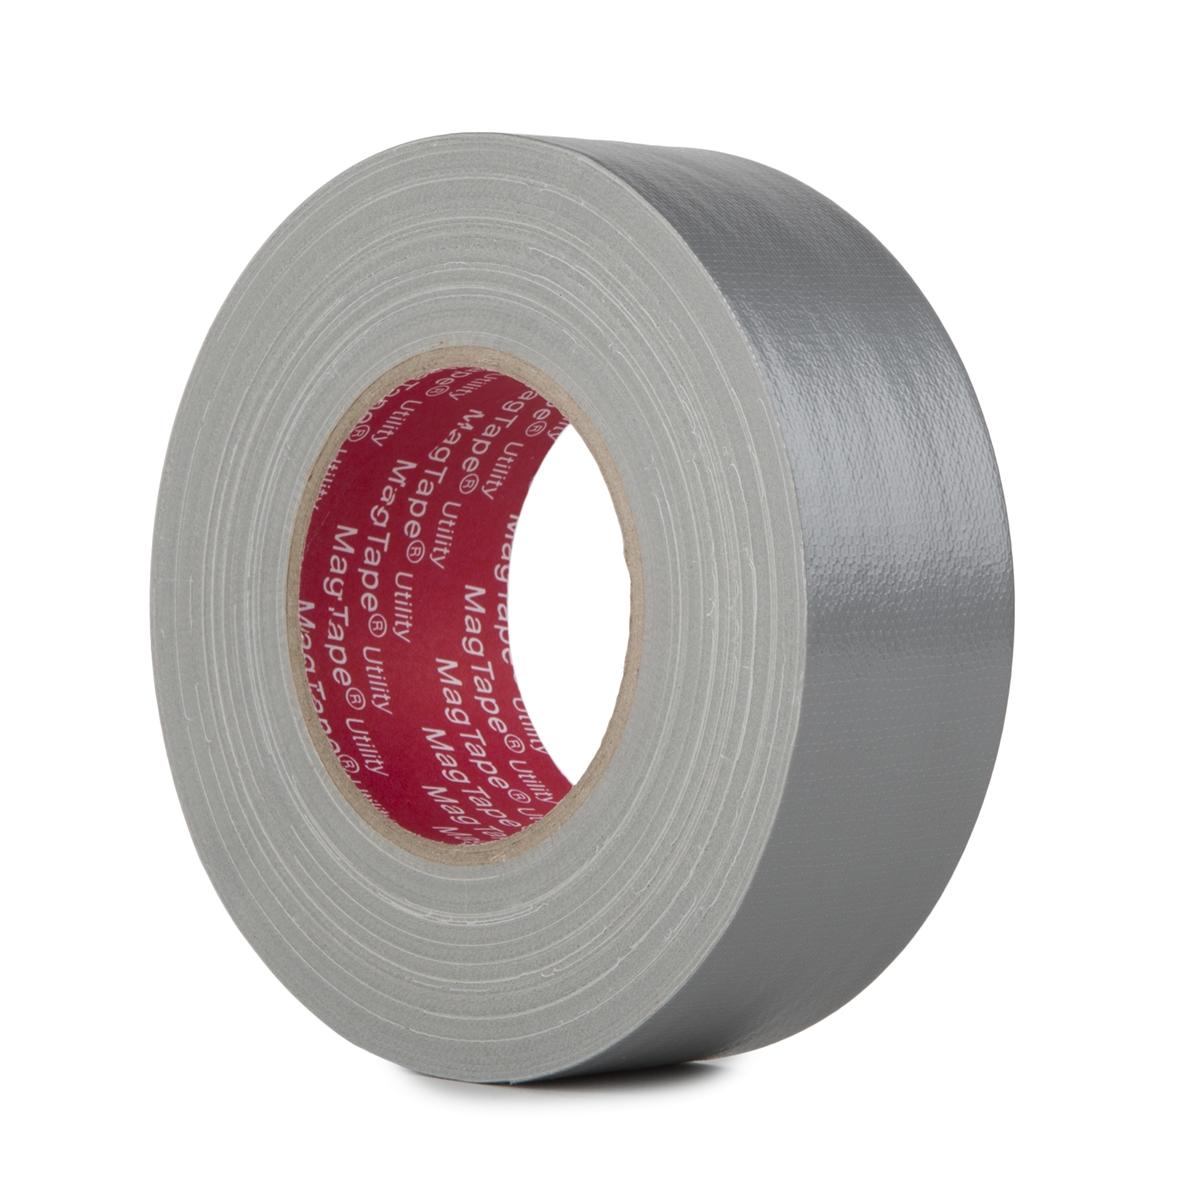 MagTape Utility gaffa tape 50mm x 50m grijs